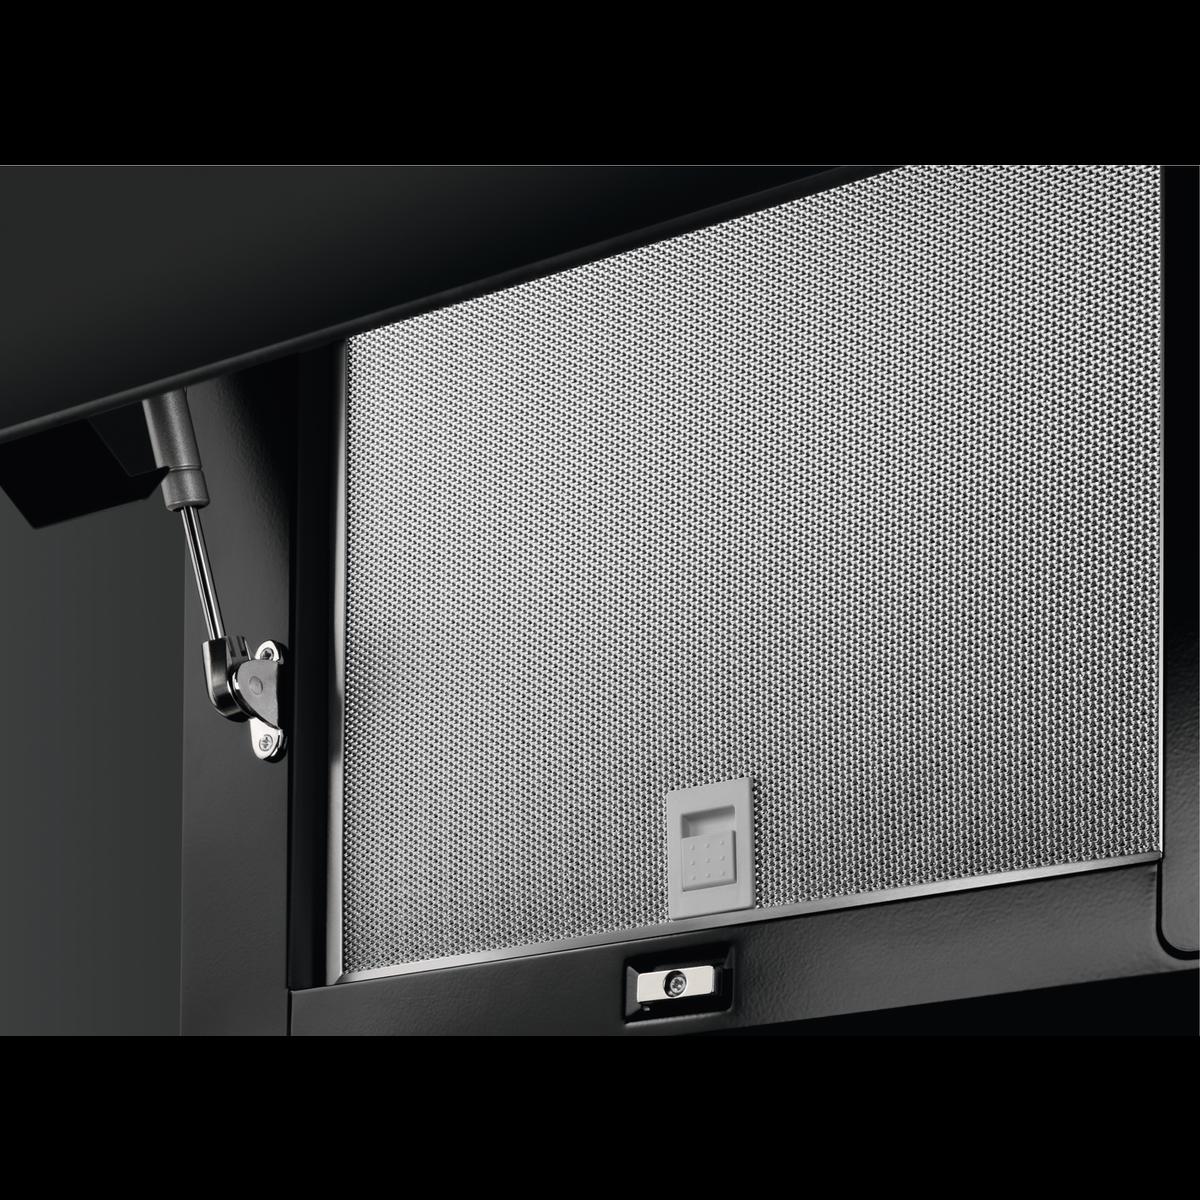 aeg dve5960hw dunstabzugshaube hai end. Black Bedroom Furniture Sets. Home Design Ideas